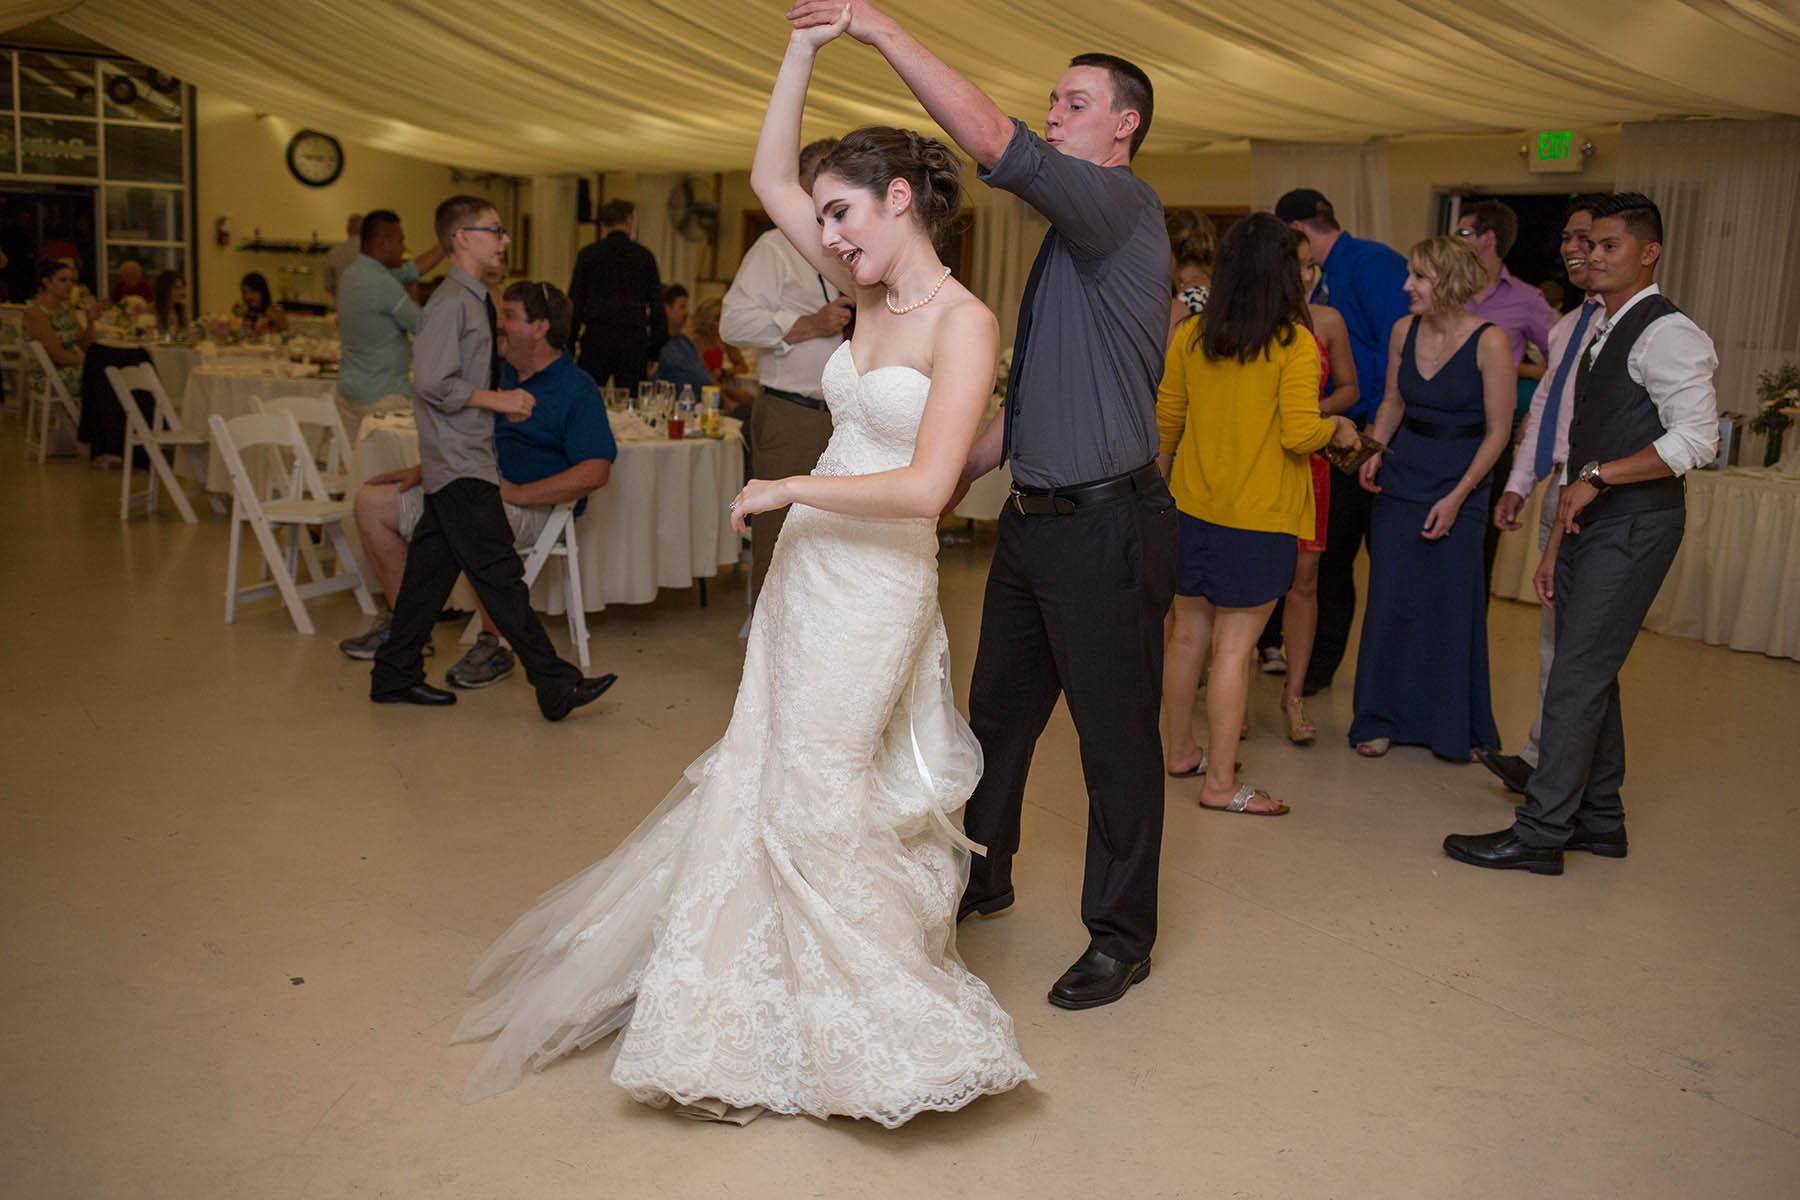 pickering-barn-issaquah-wedding-photography048.jpg